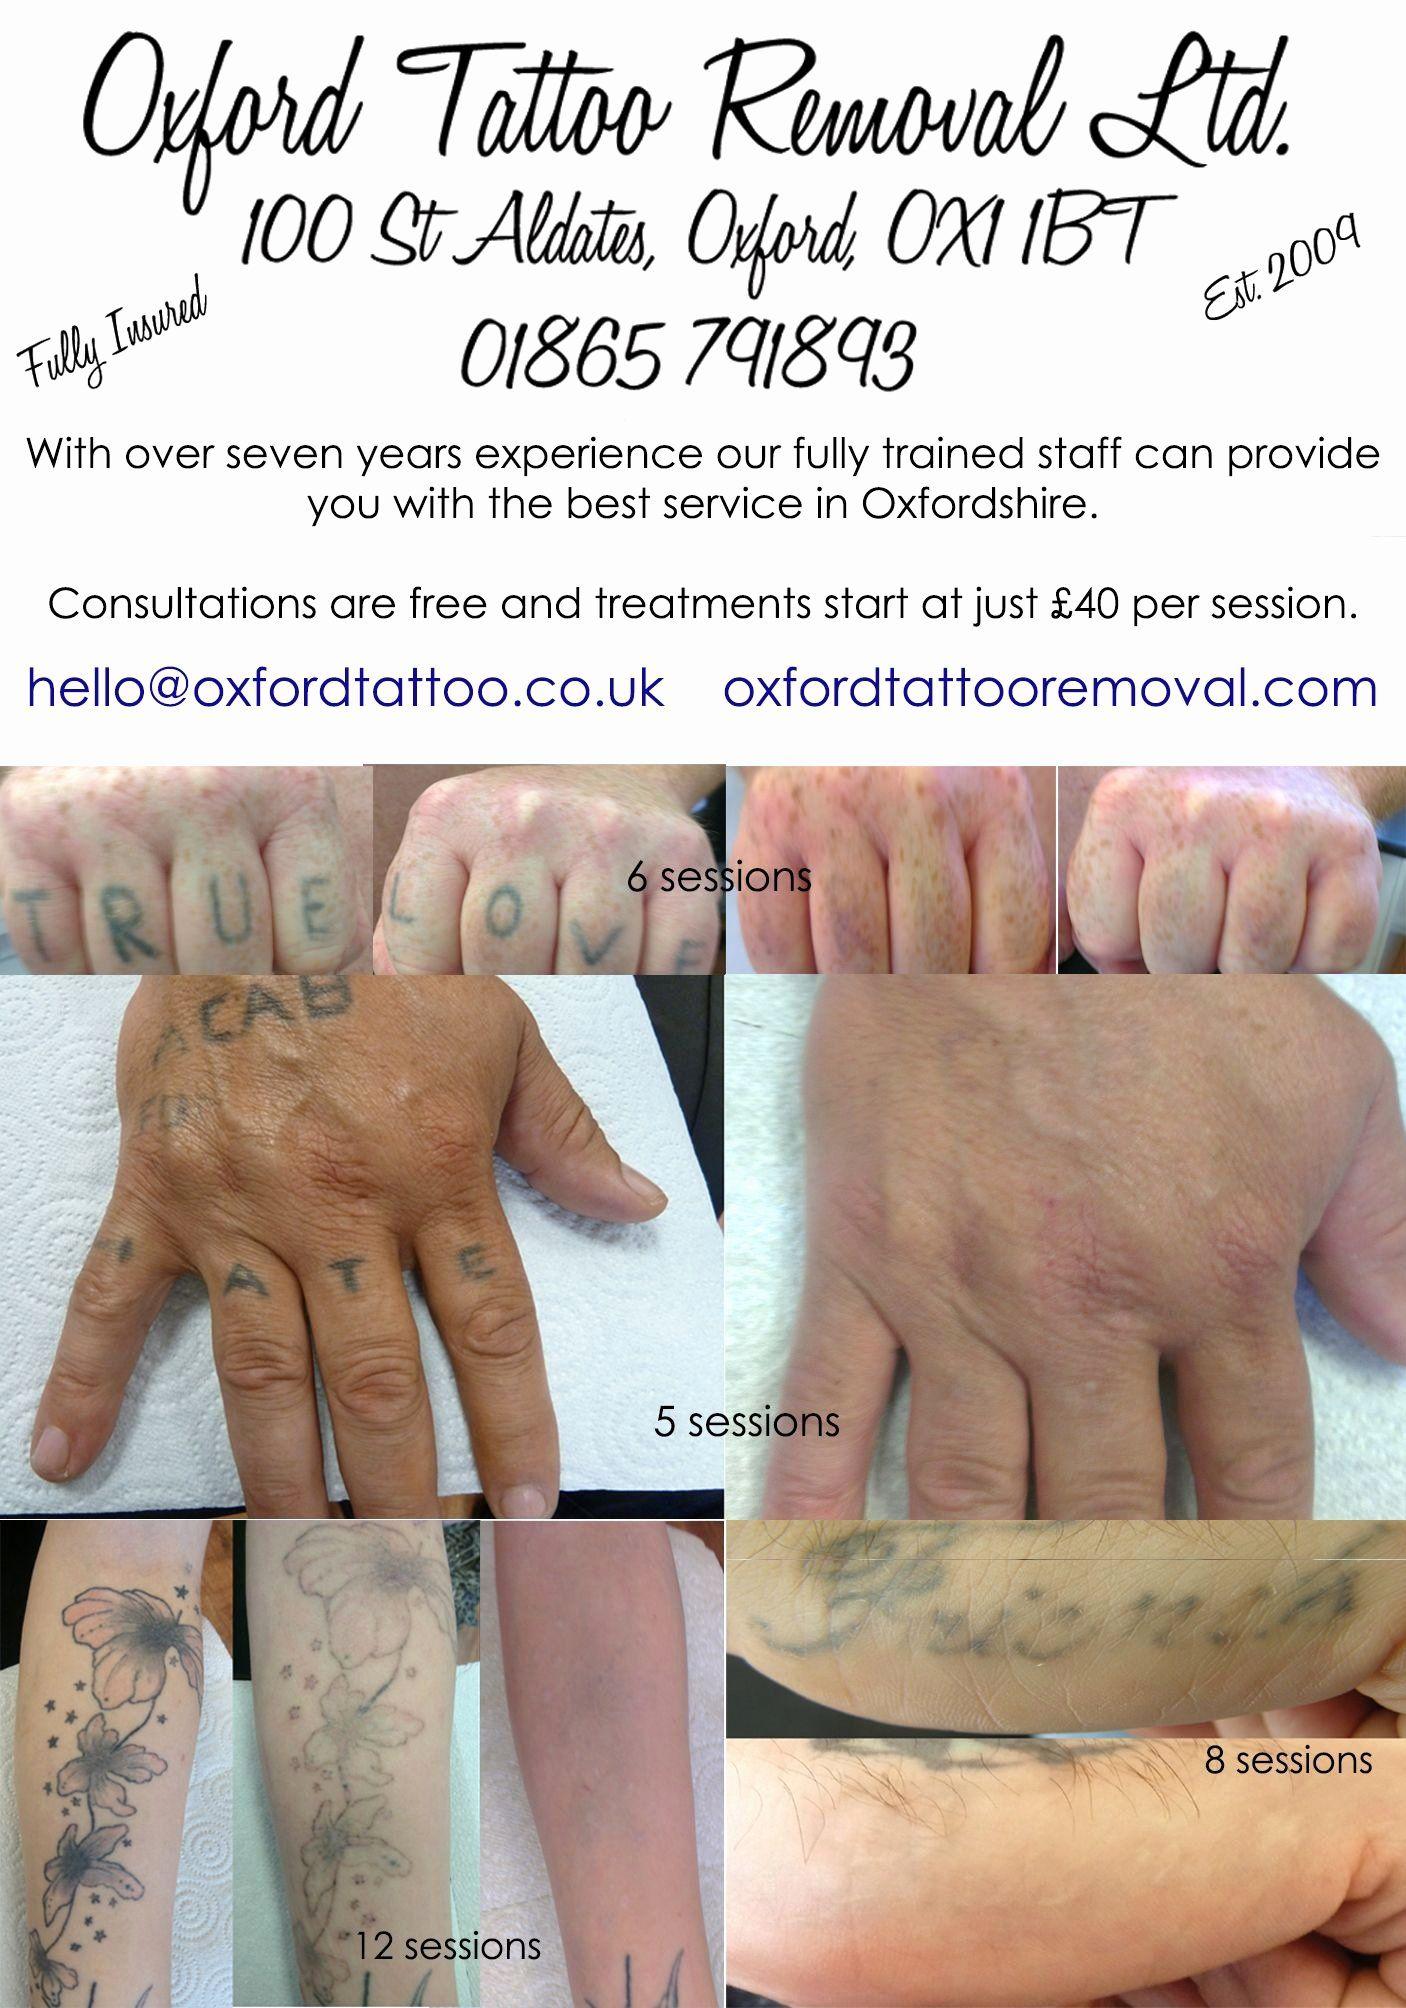 Pin By Rox Coronado On Tattoos Tattoo Removal Finger Tattoos